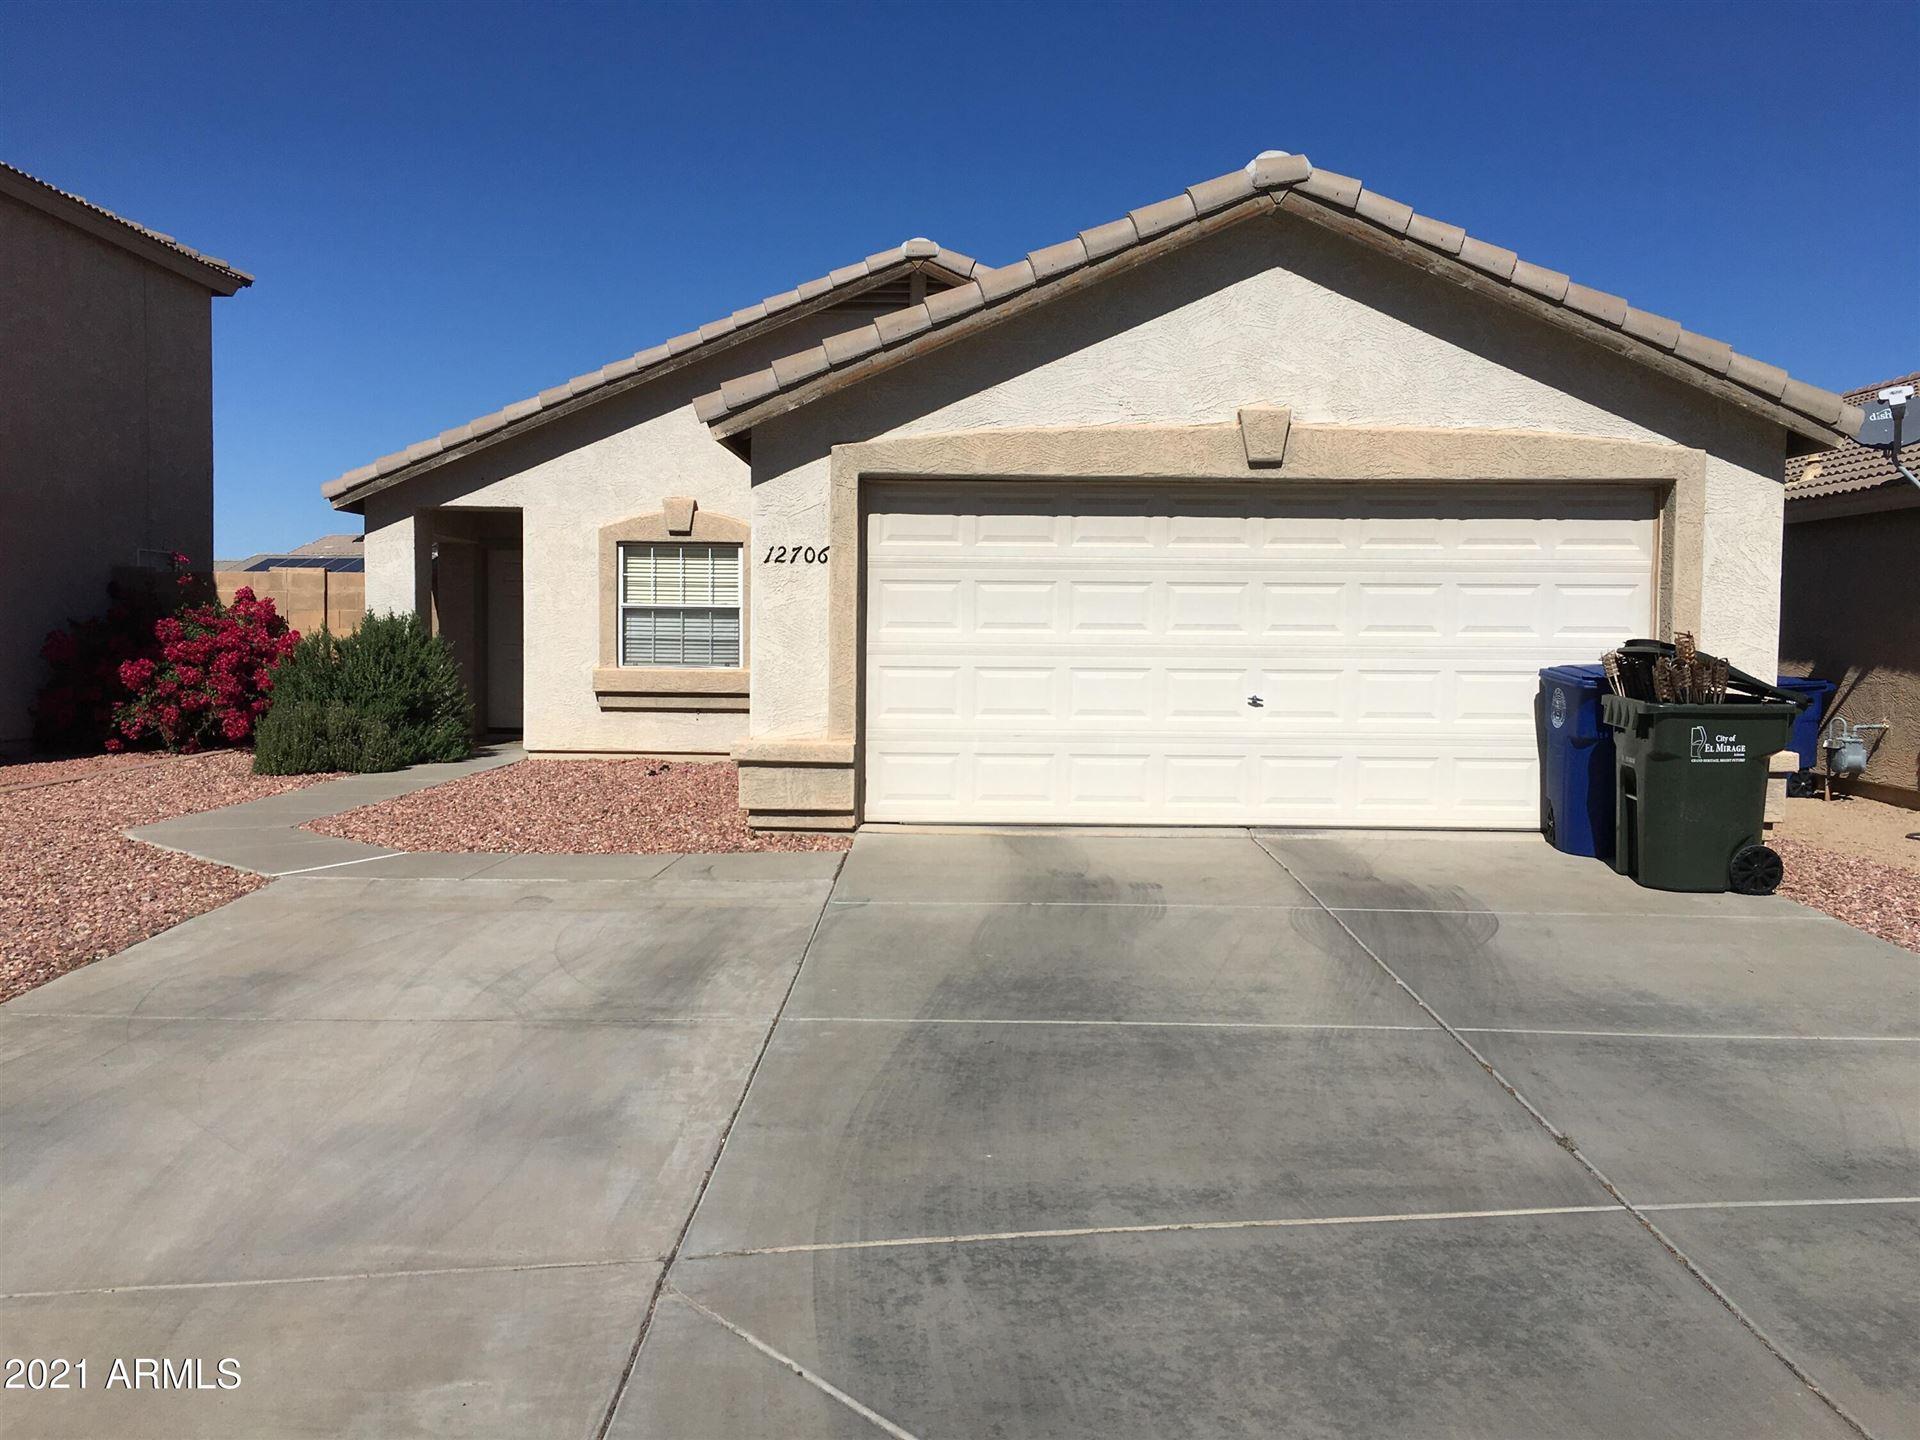 Photo of 12706 W MYER Lane, El Mirage, AZ 85335 (MLS # 6289702)